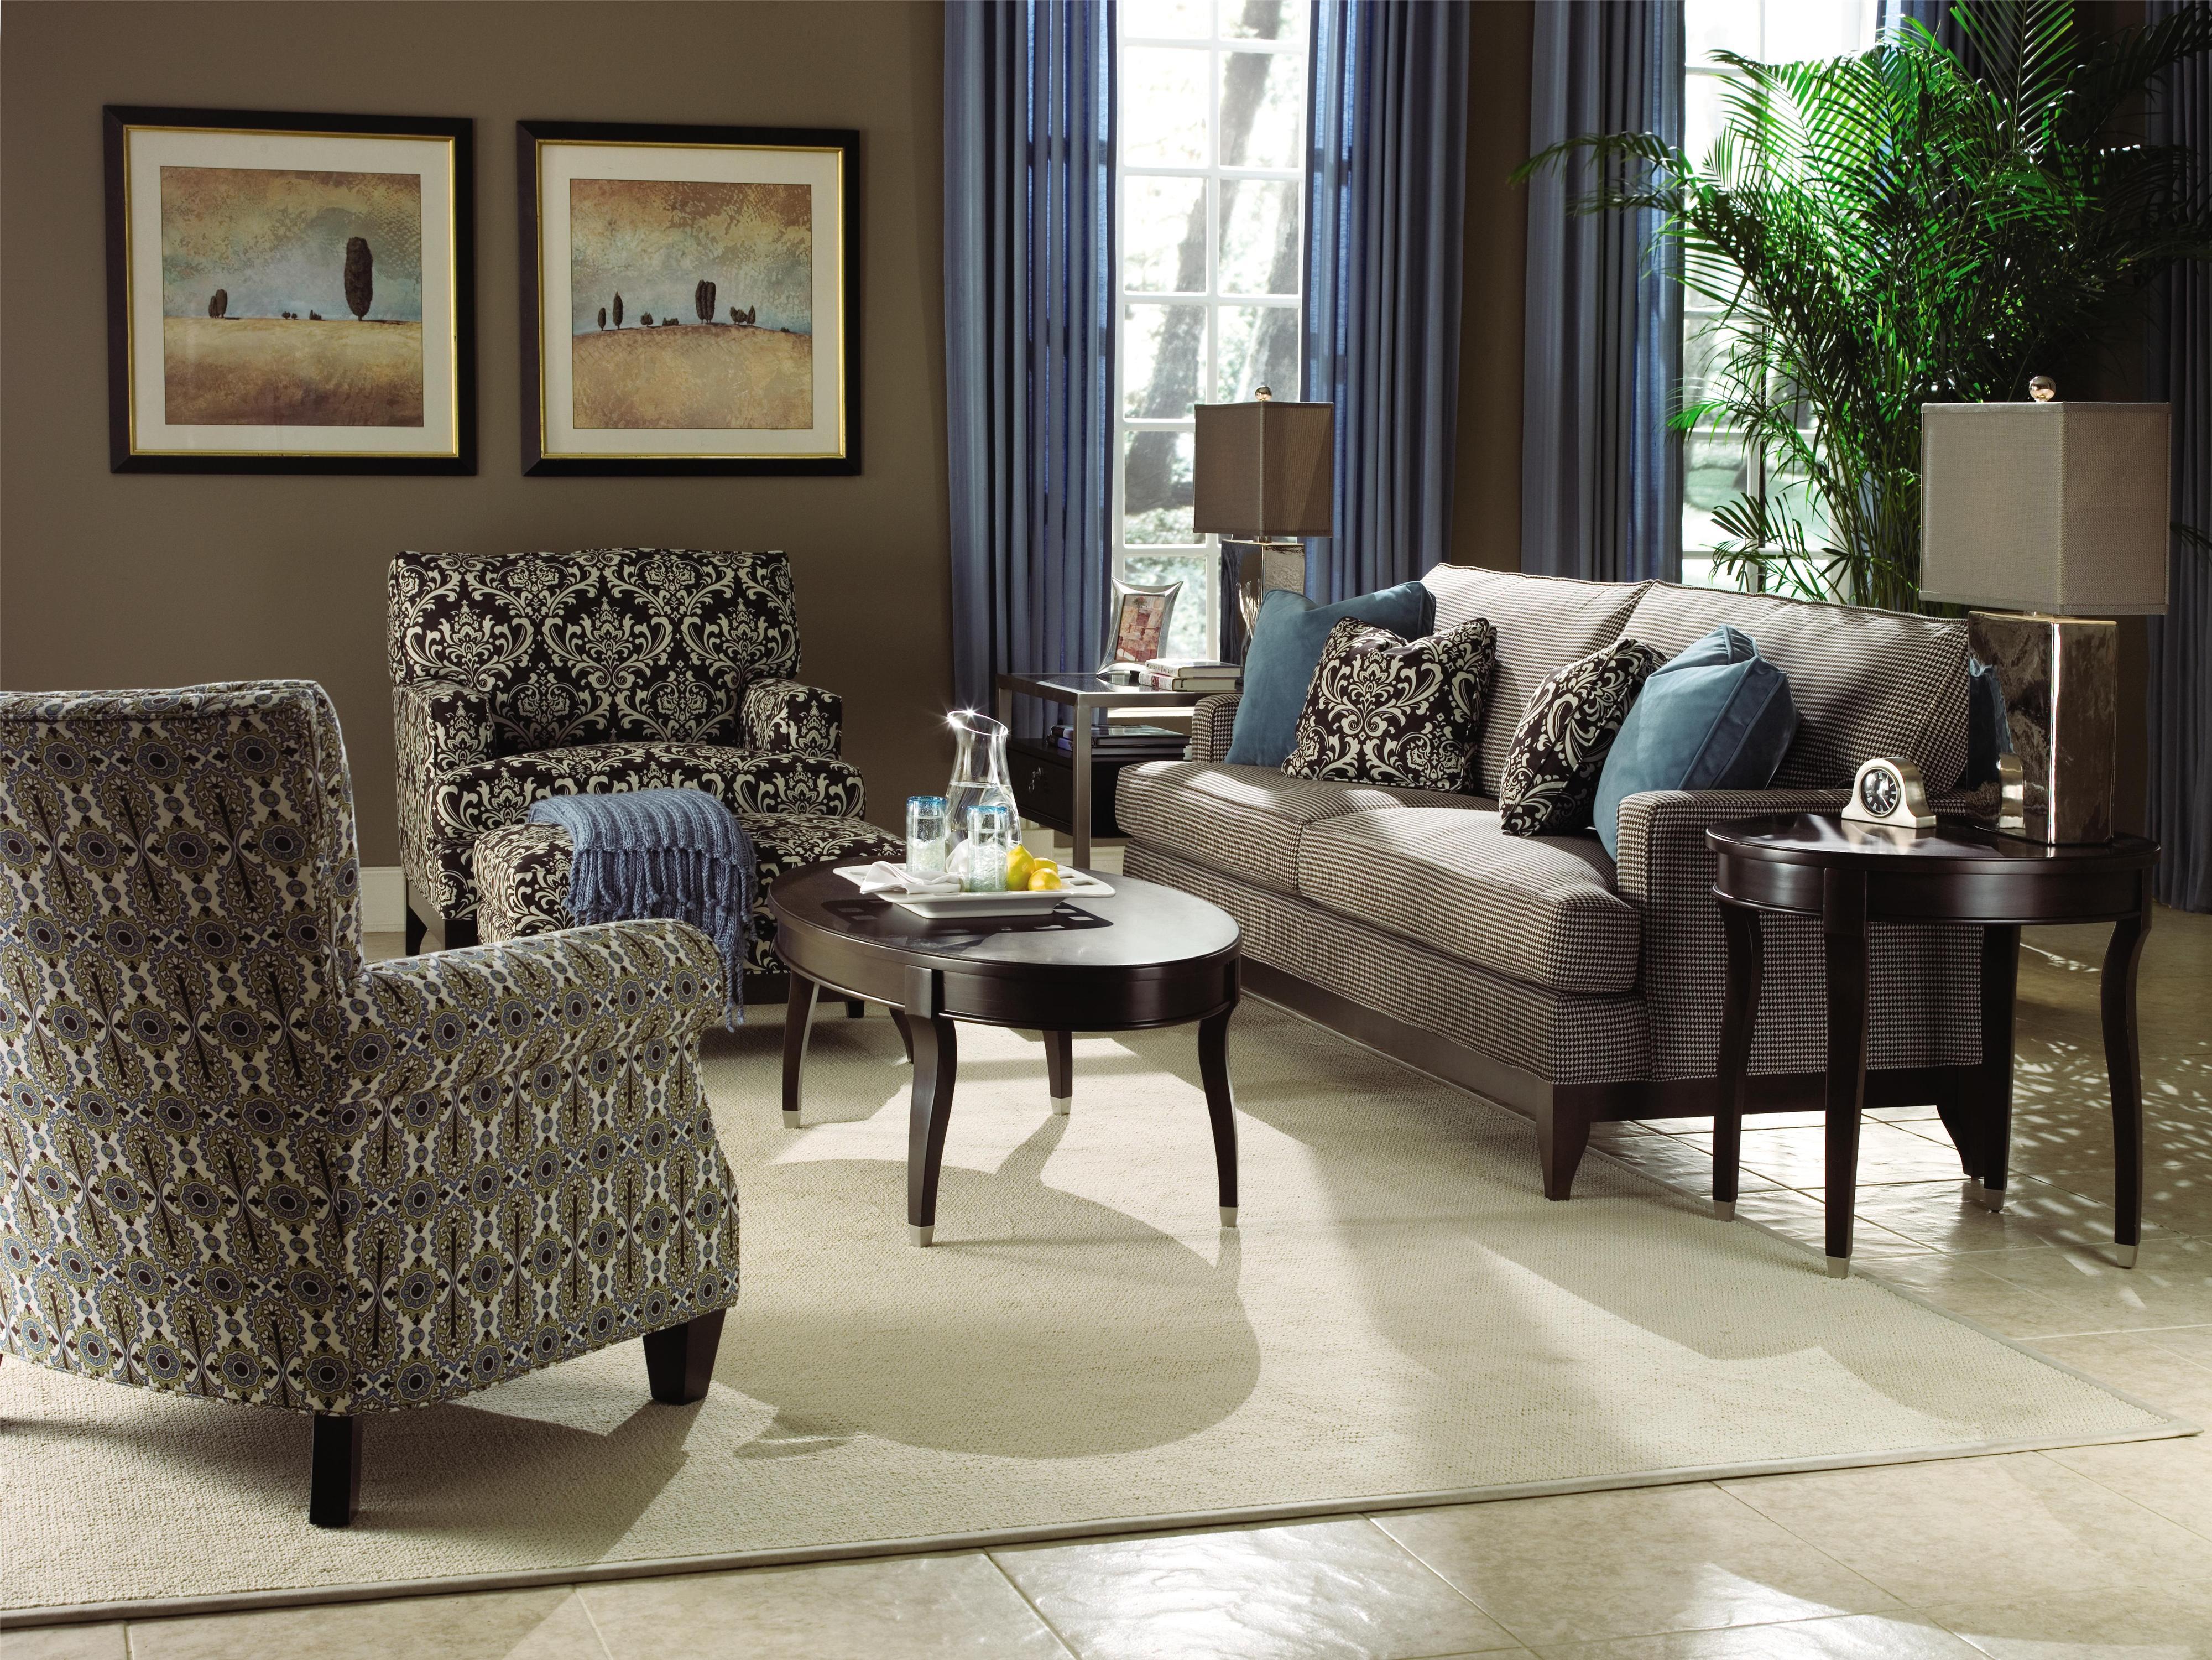 Alston 629 by kincaid furniture adcock furniture for Kincaid furniture